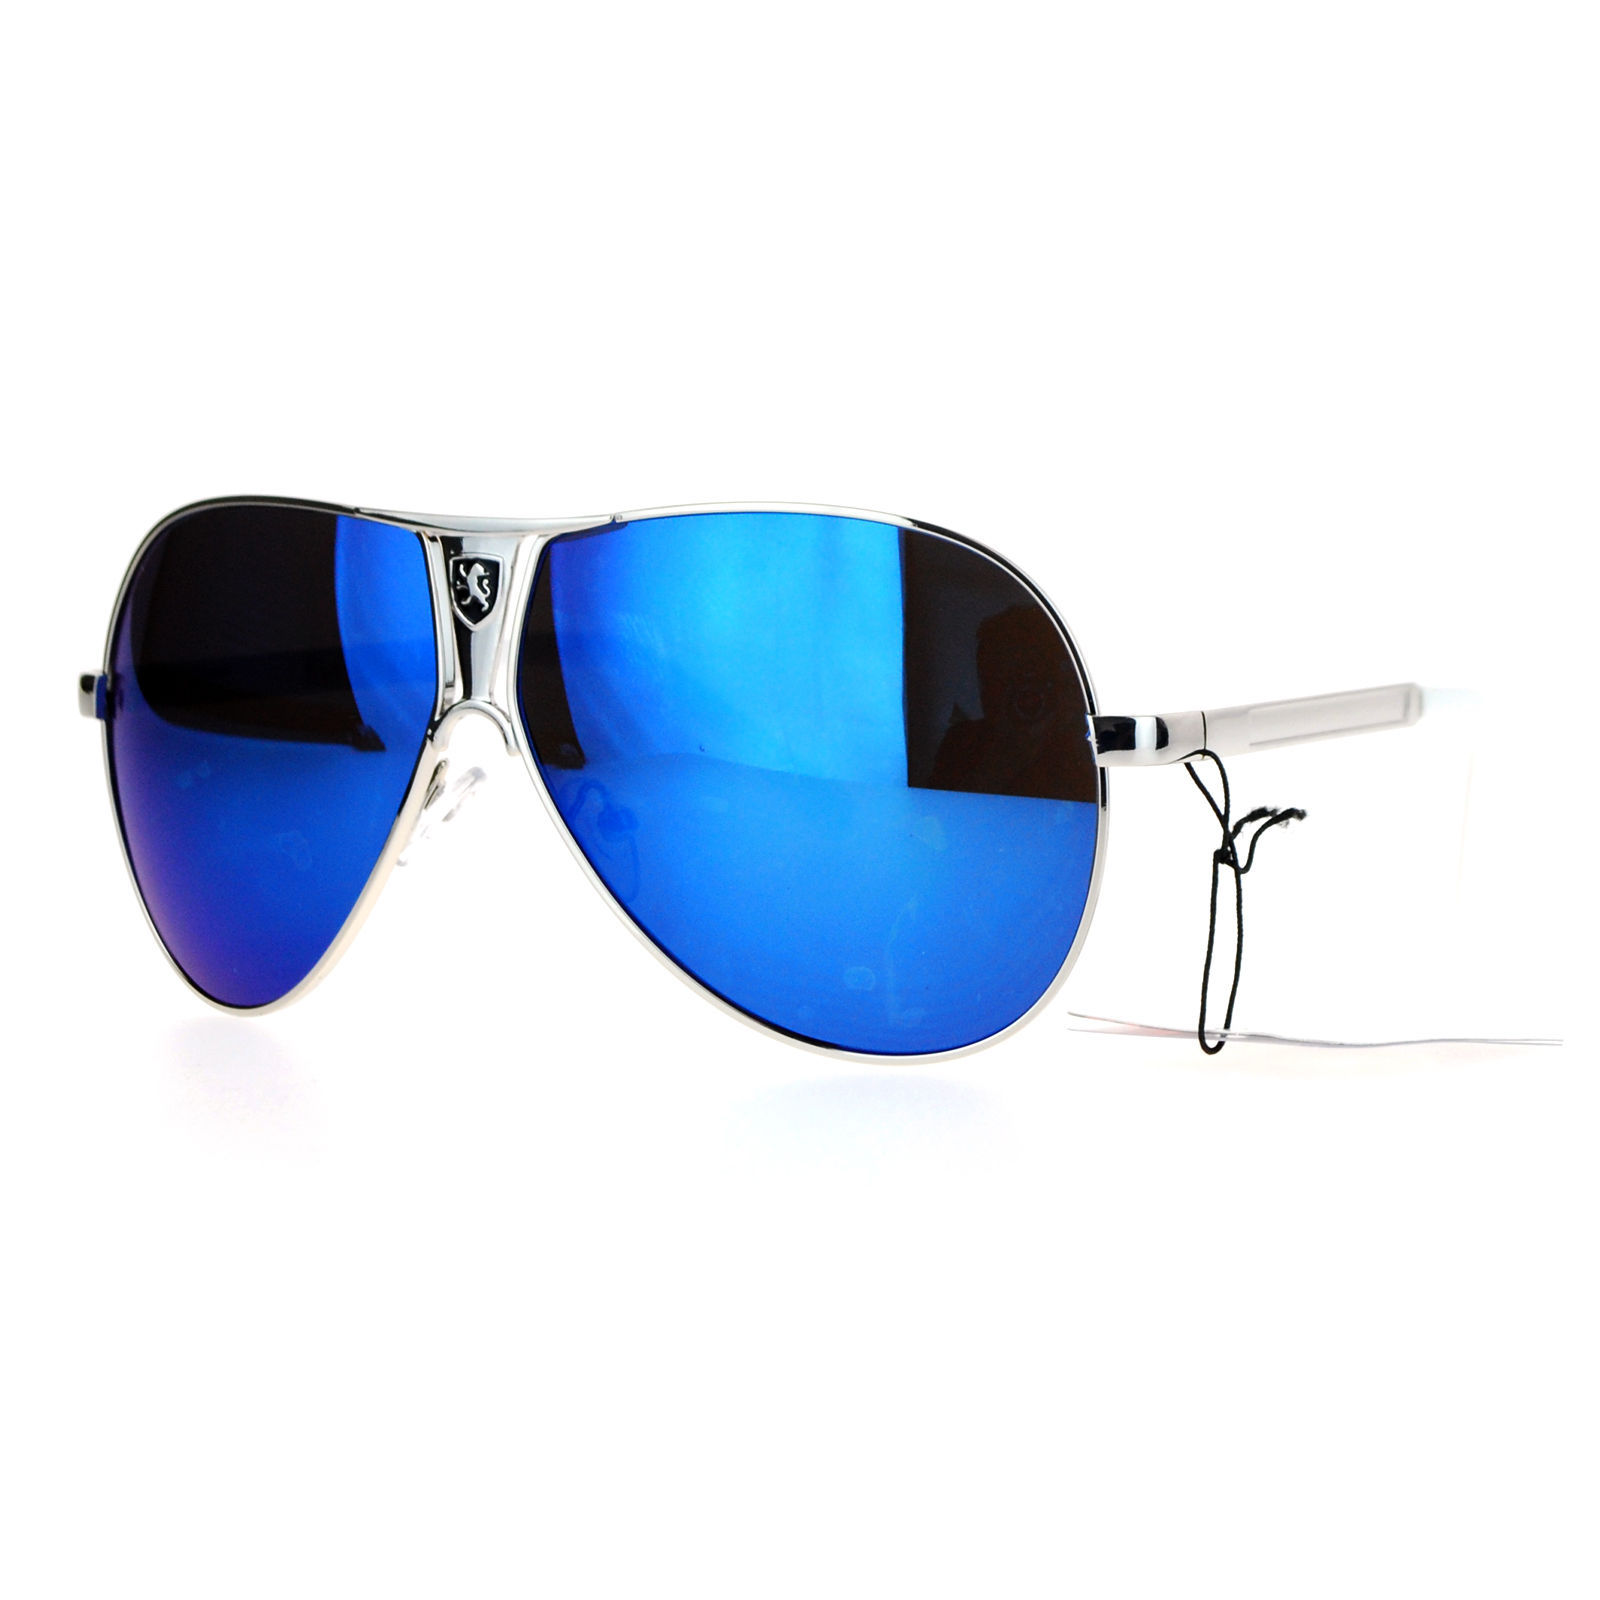 Khan Aviator Sunglasses Unisex Fashion Metal Racer Aviators UV 400